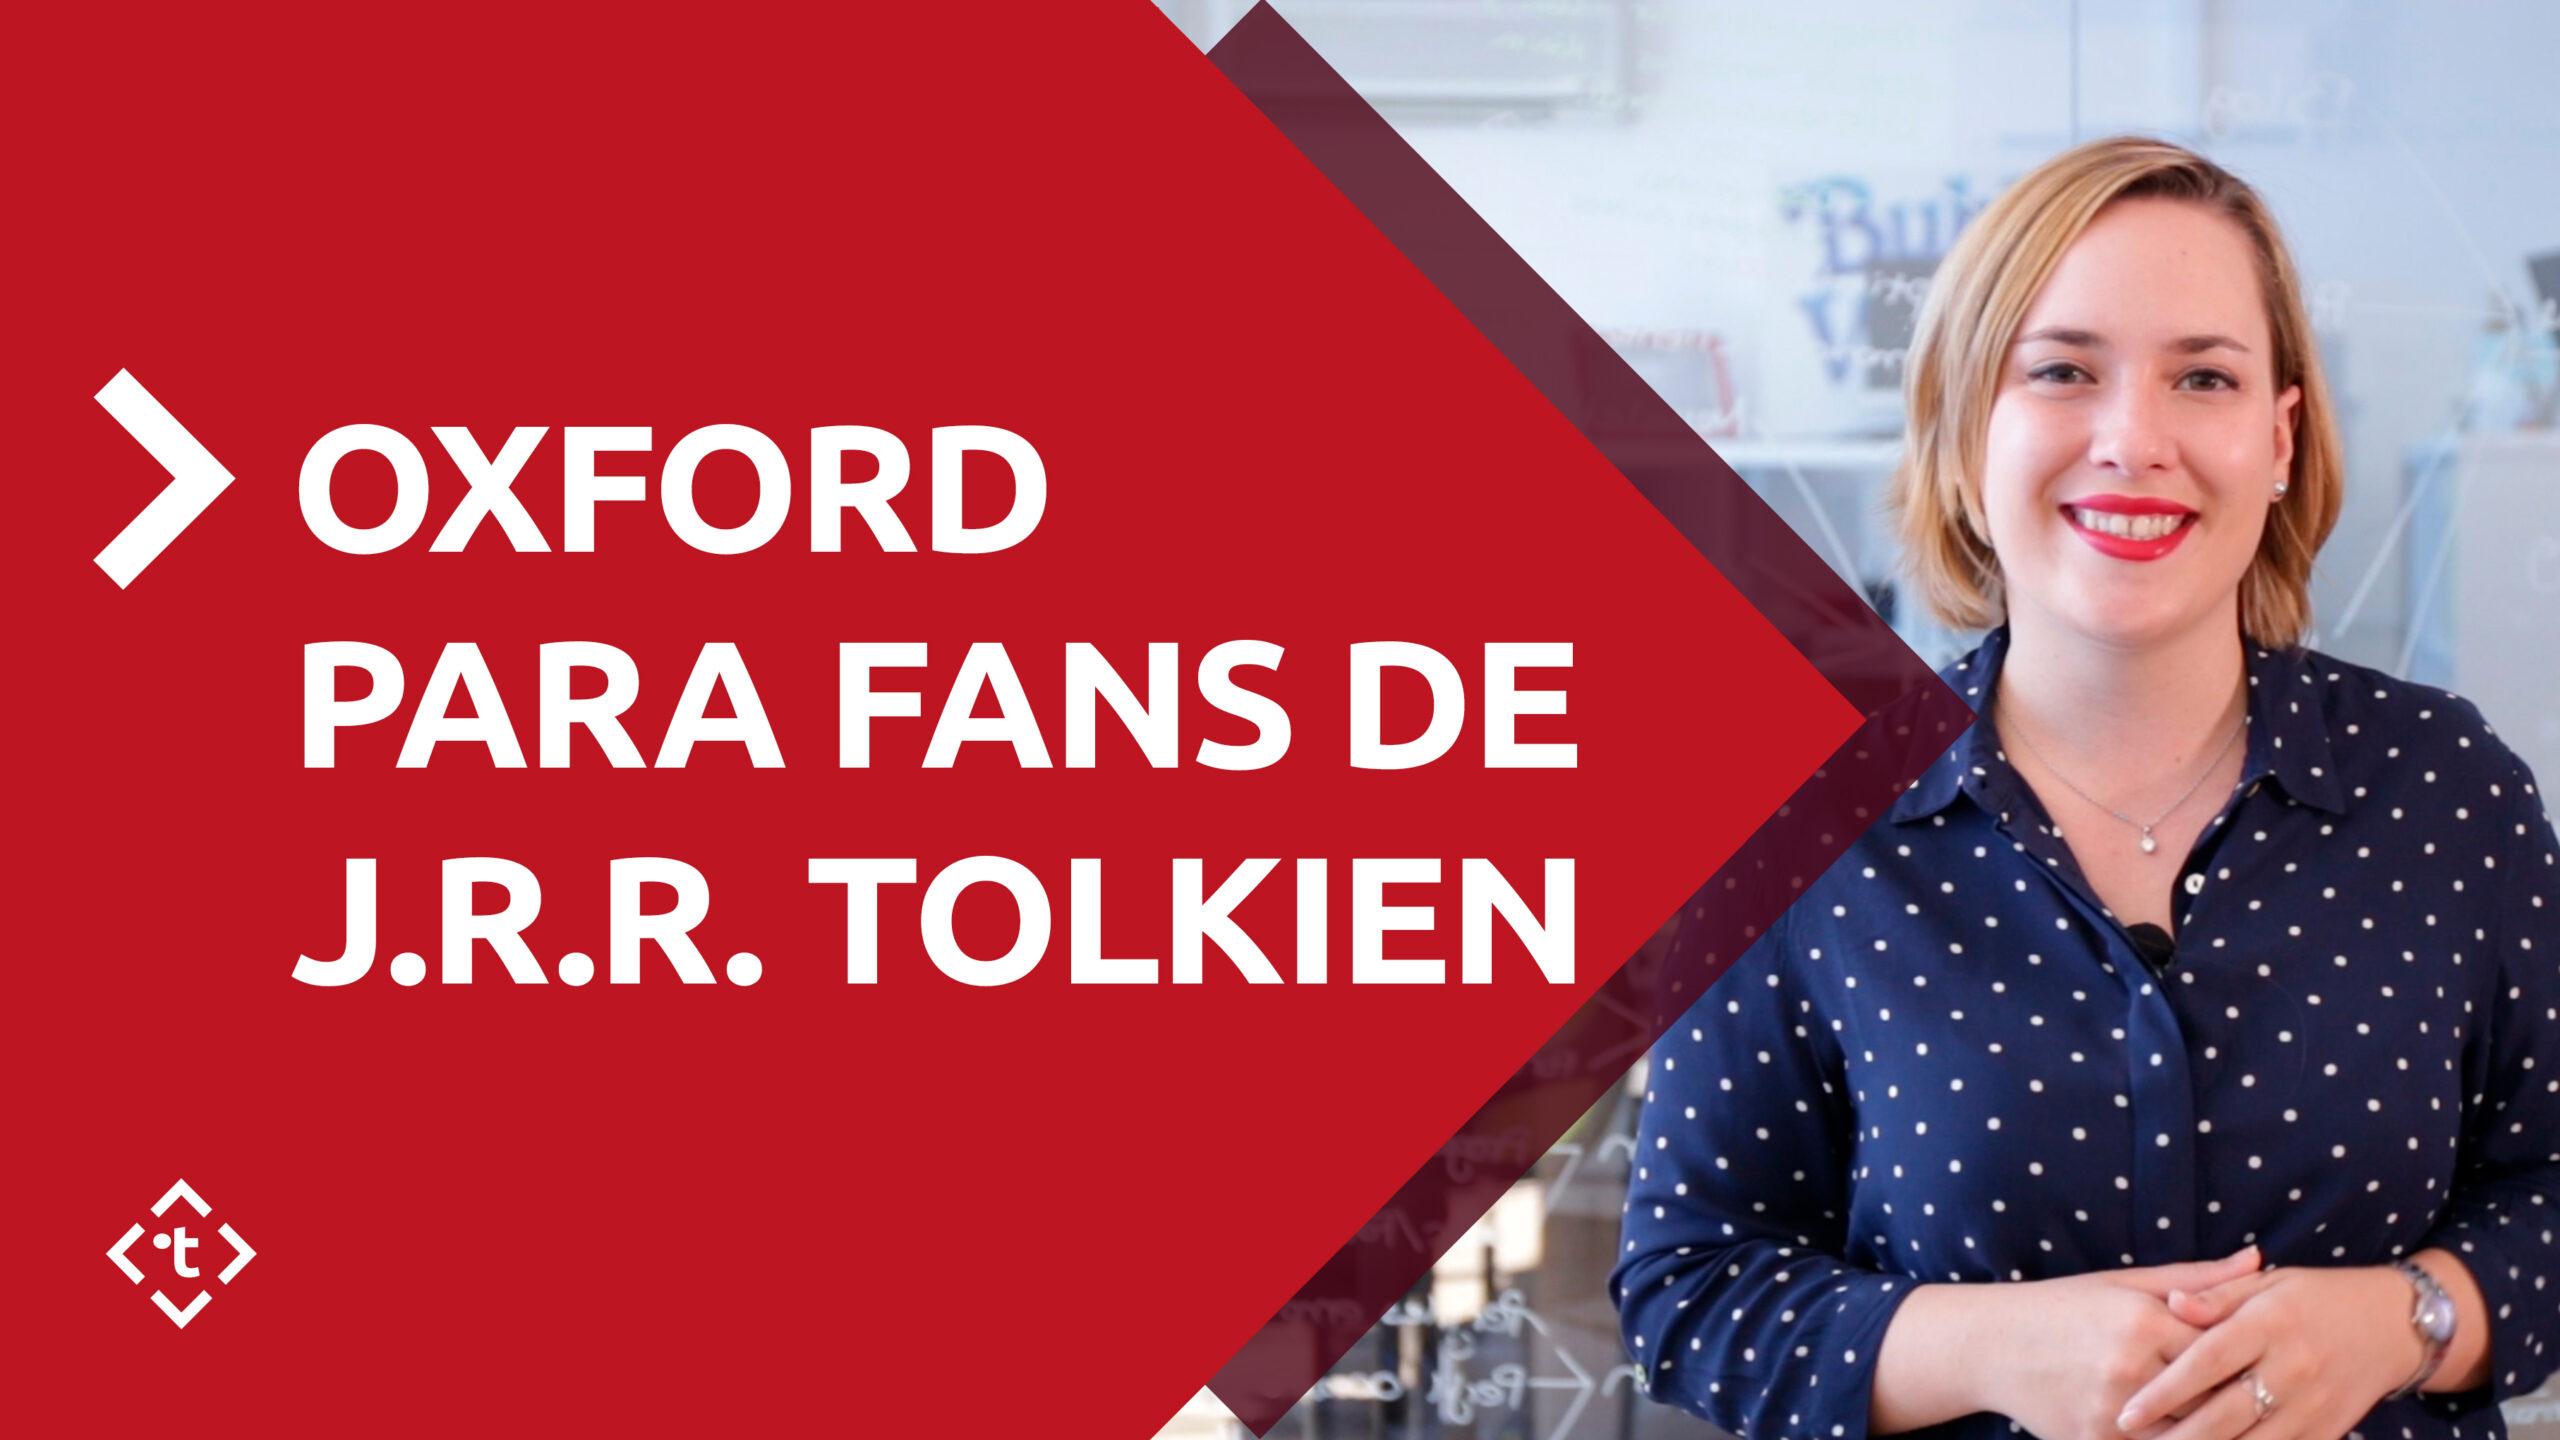 OXFORD PARA FANS DE J.R.R. TOLKIEN